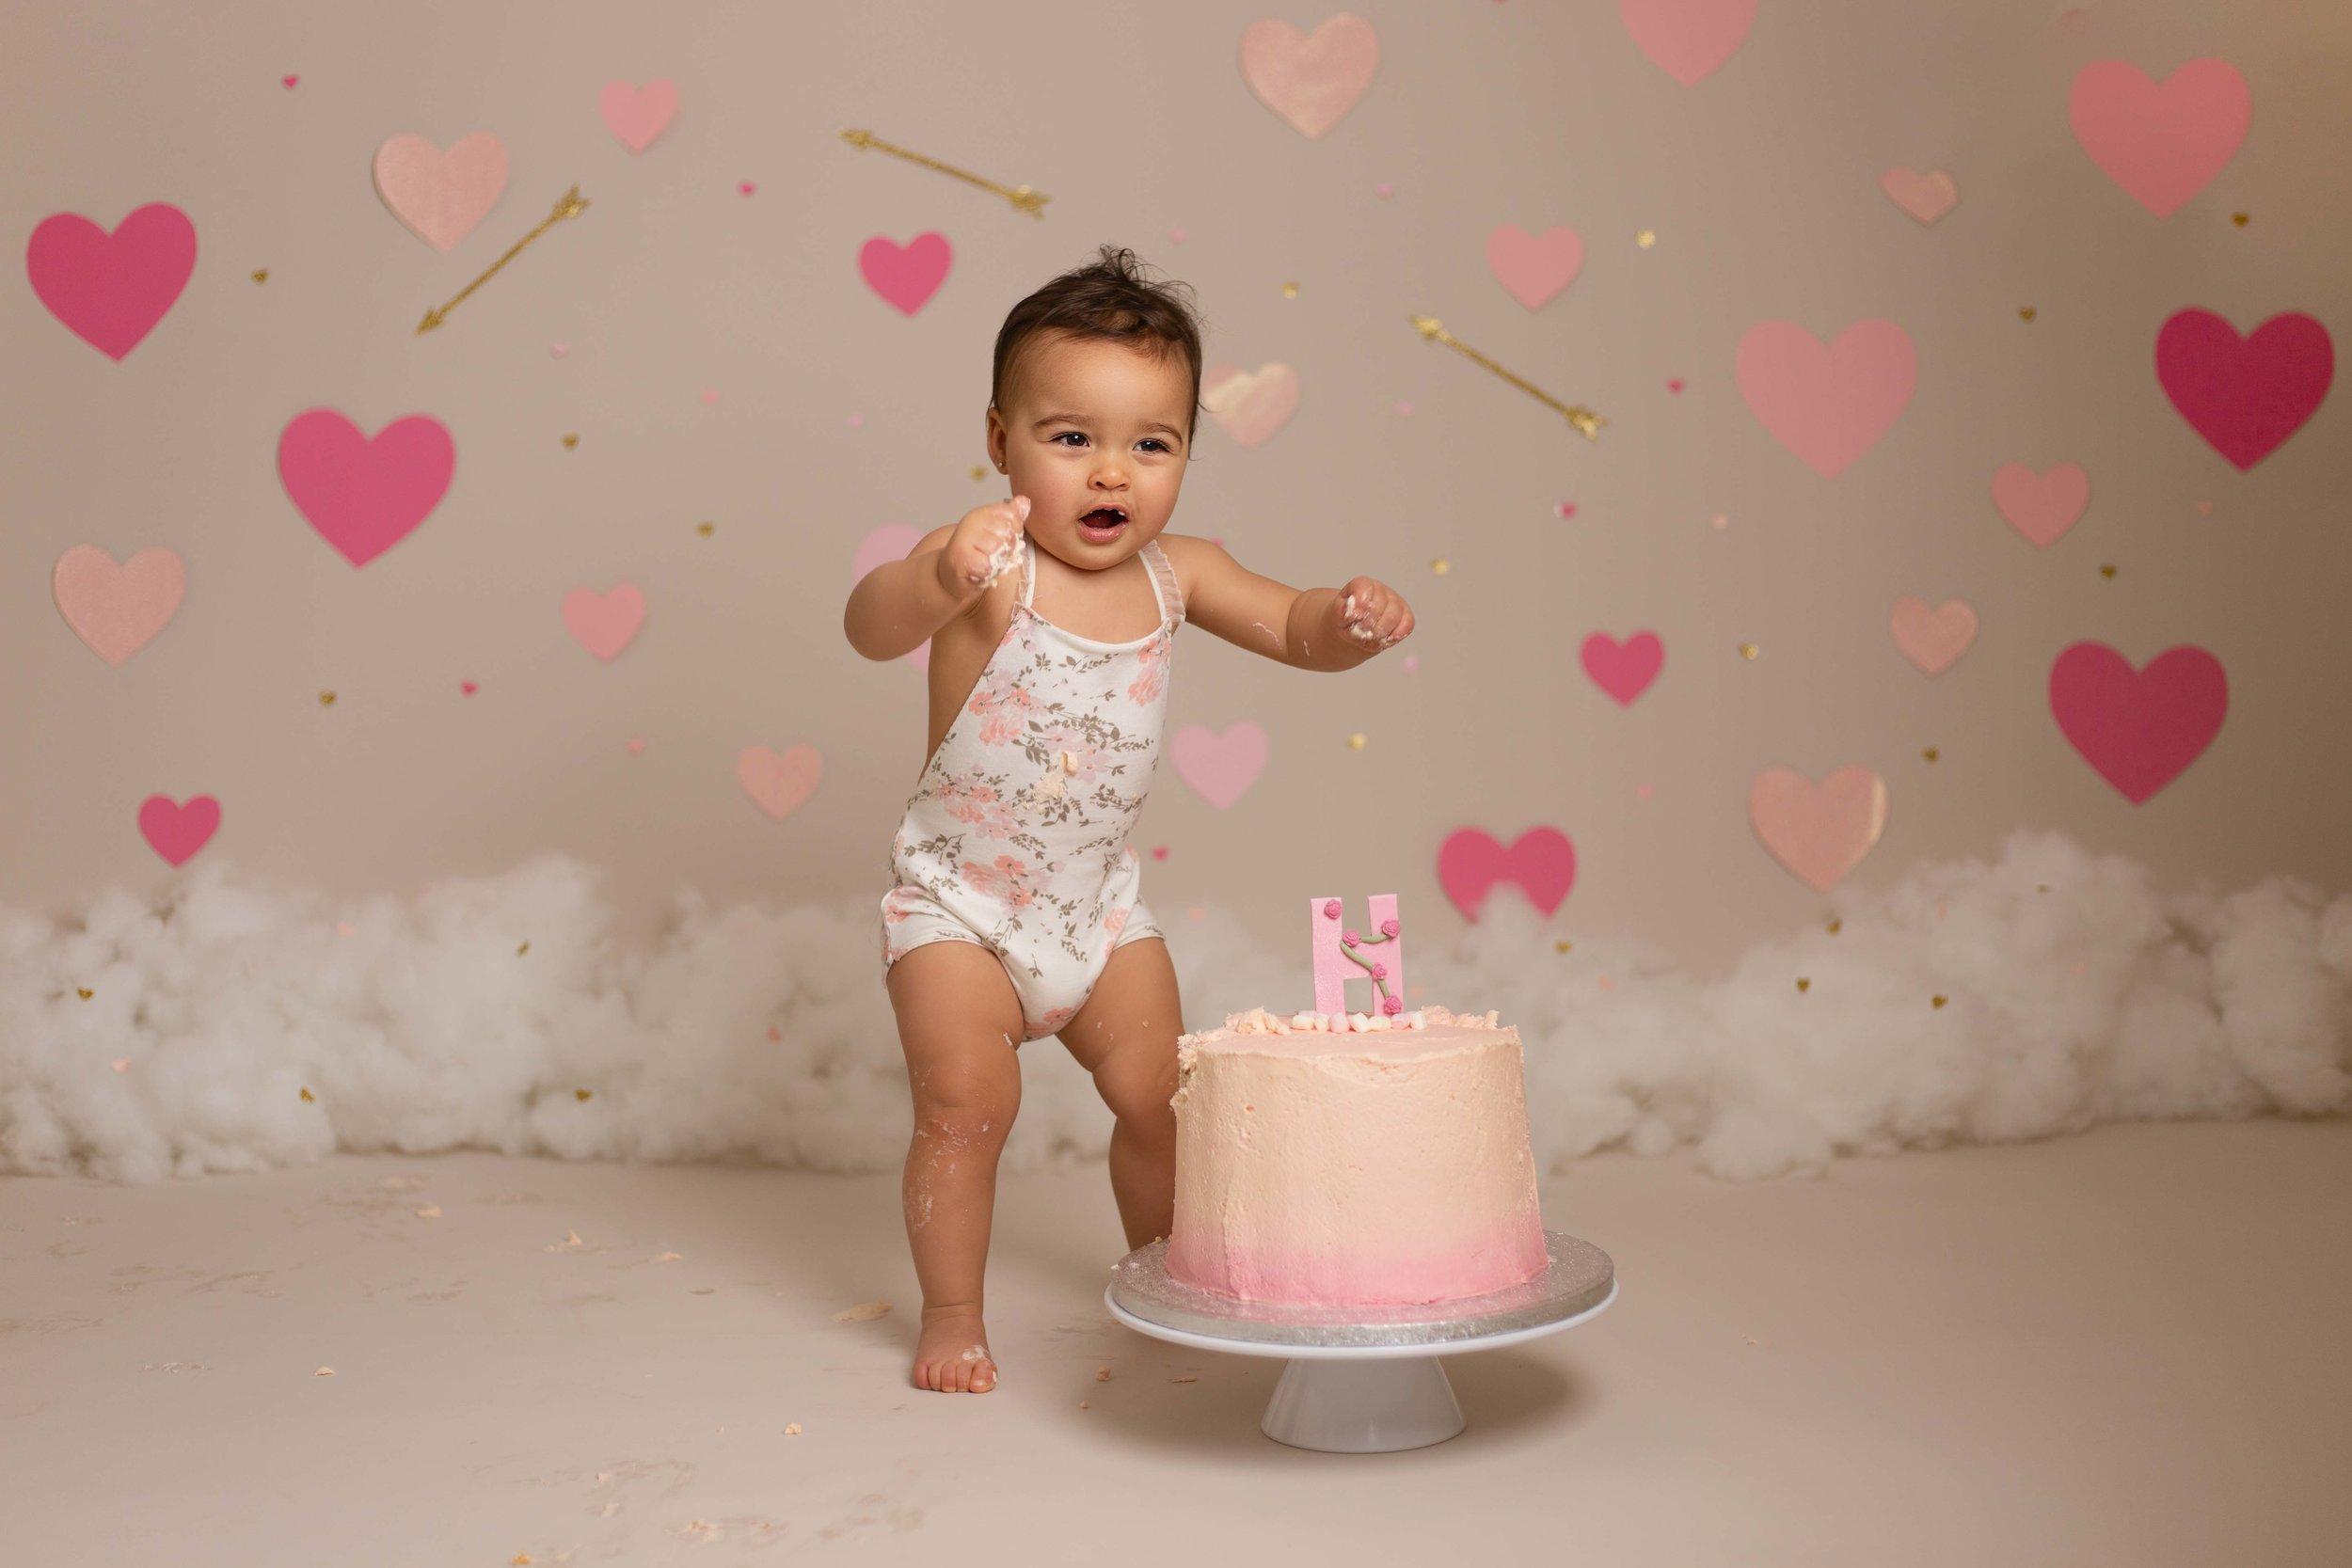 Lea-cooper-photography-cake-smash-photographer-1st-birthday-photos-willenhall-wolverhampton-west-midlands-birmingham-valentines-day-23.jpg